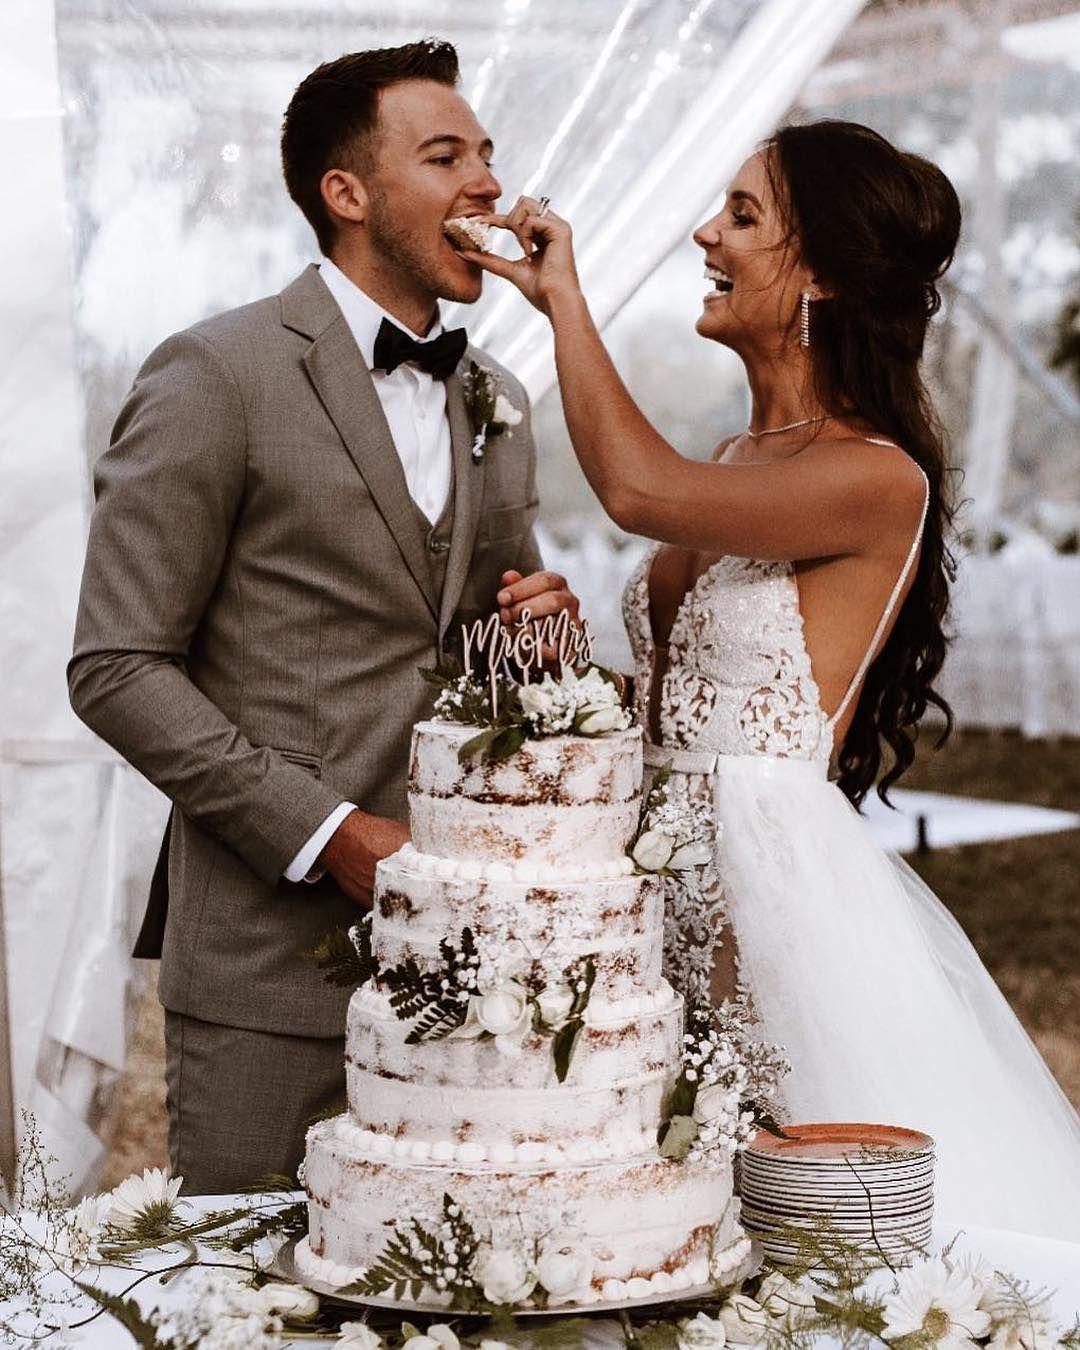 21 Creative Wedding Photo Ideas with Bridesmaids and Groomsmen #weddingphotoideas